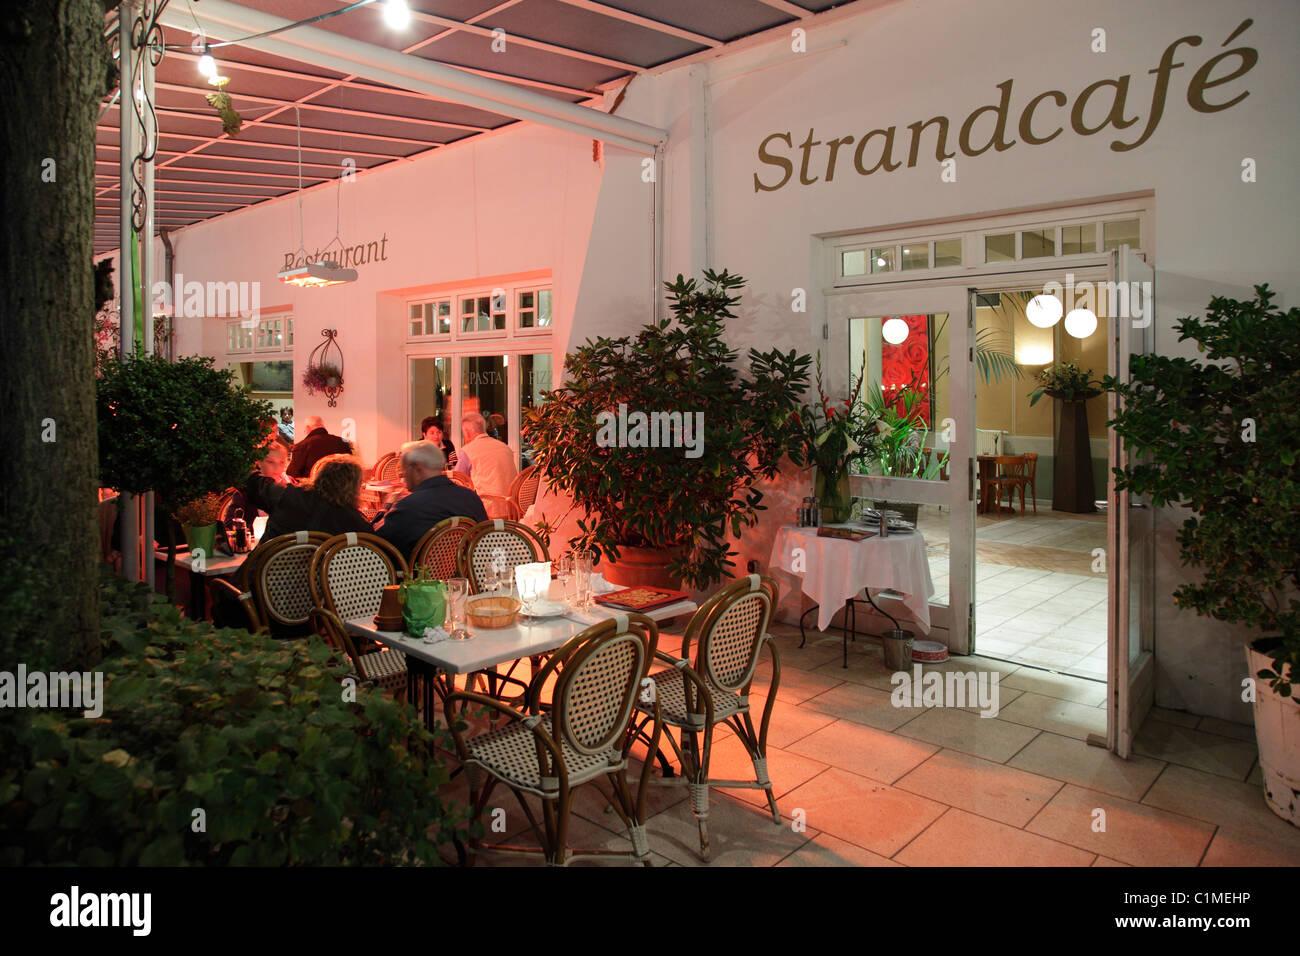 Strandcafé Binz at evening - Stock Image